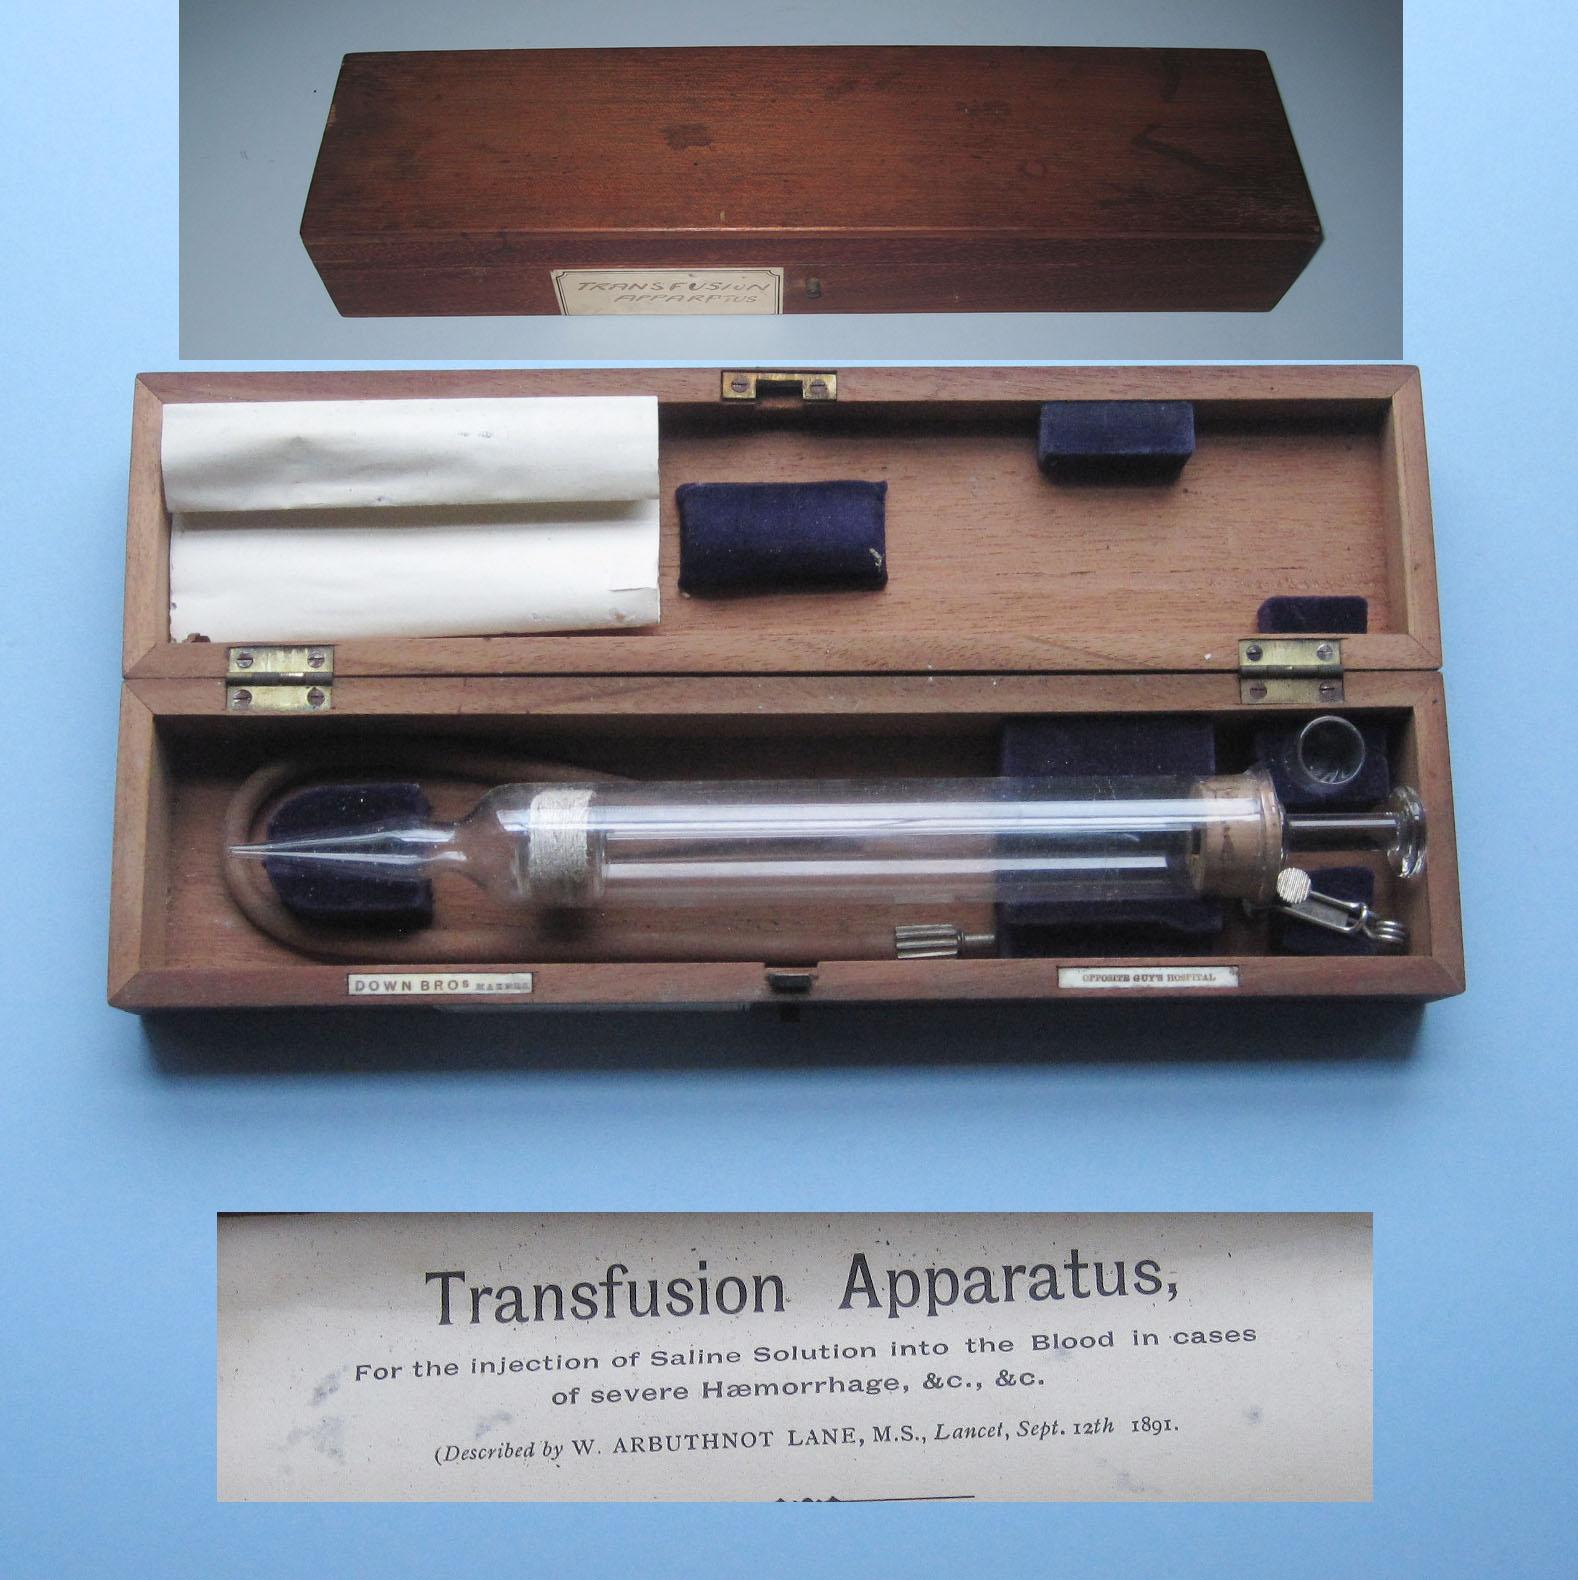 C1900 Arbuthnot's Transfusion Apparatus (Down Bros, London)